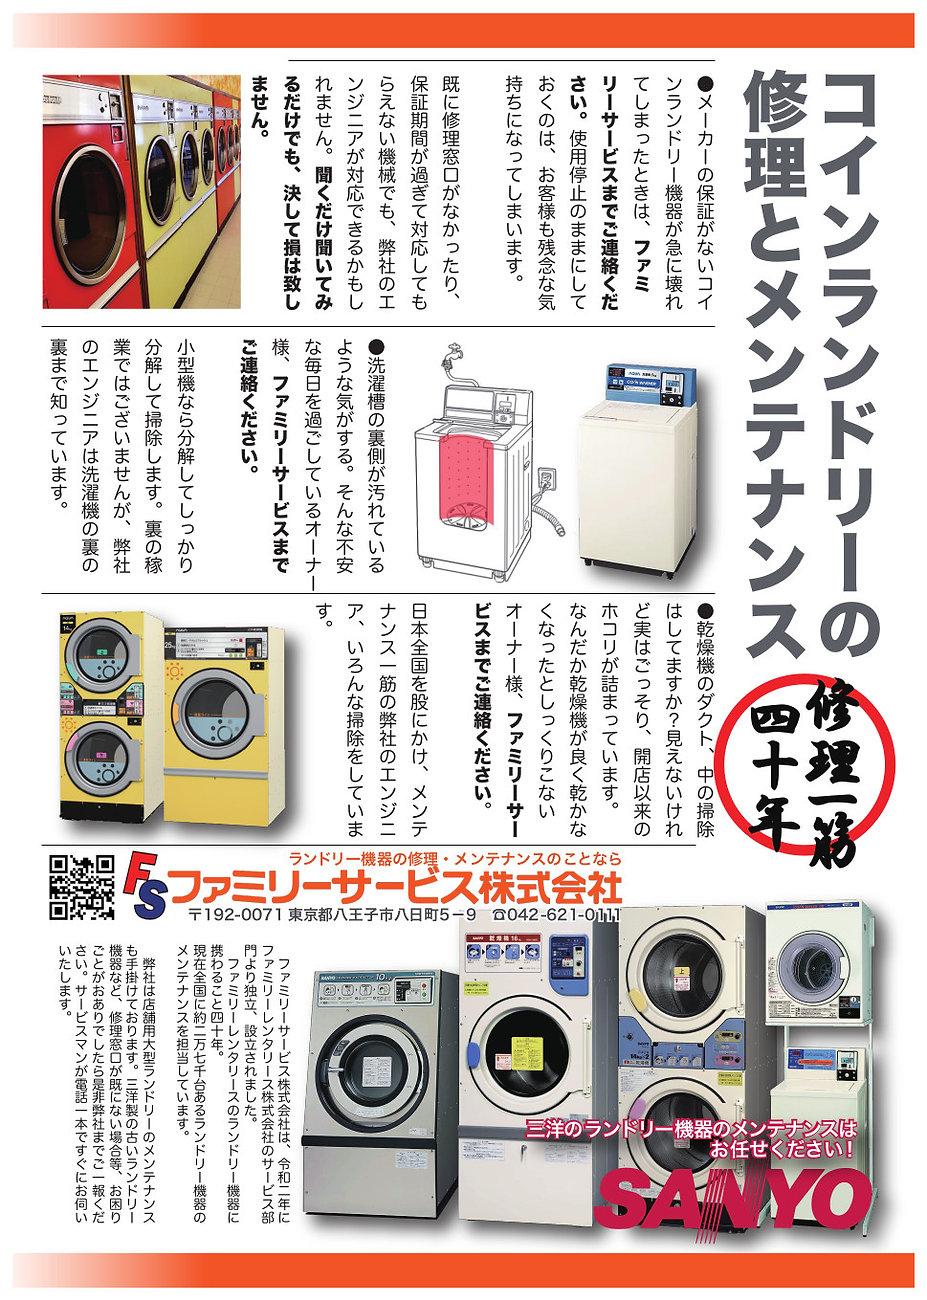 FS_NCHコラボ用チラシ【裏】_cmyk.jpg